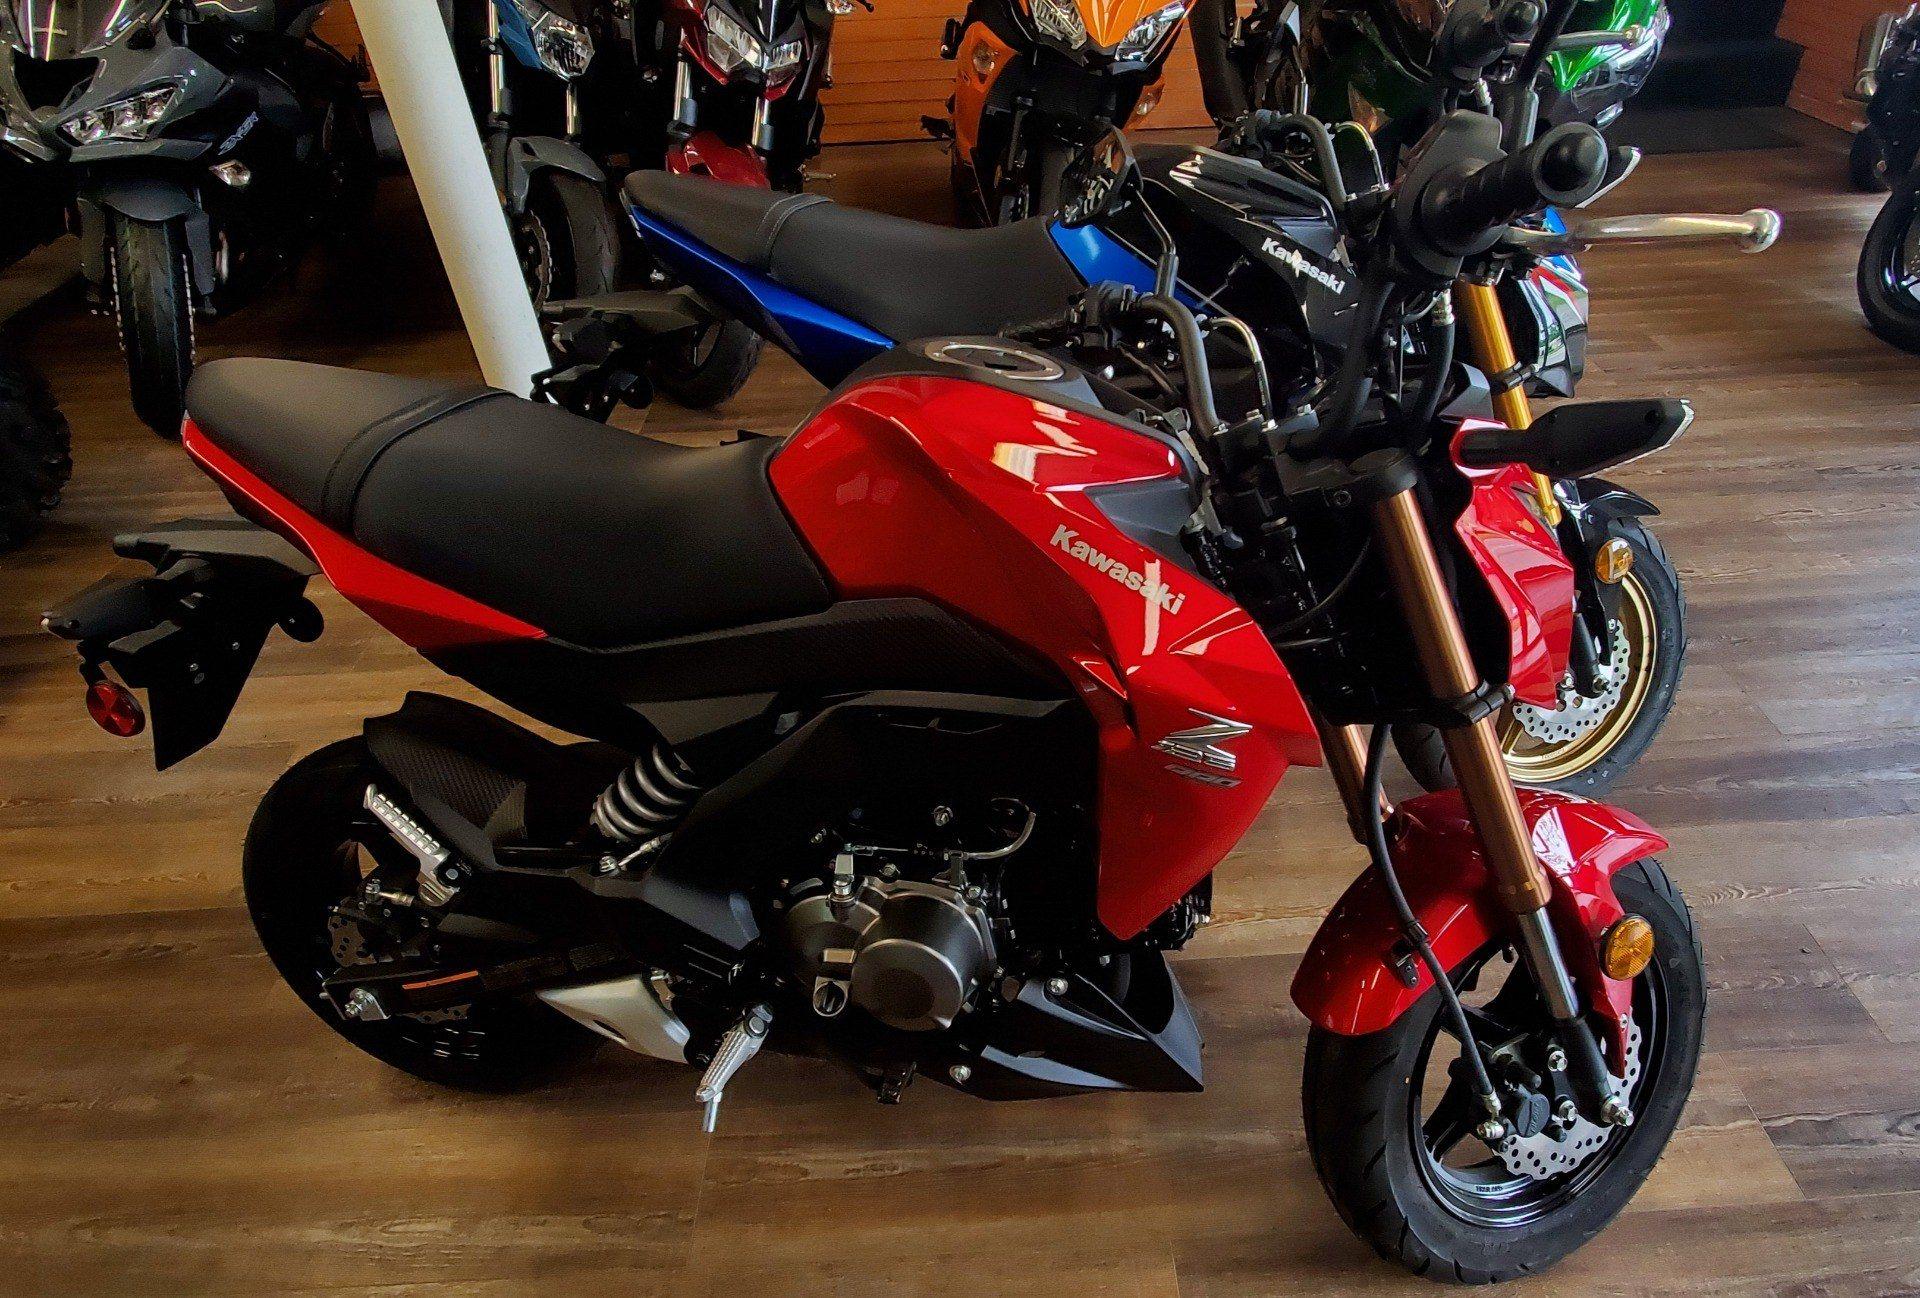 2018 Kawasaki Z125 Pro in Ledgewood, New Jersey